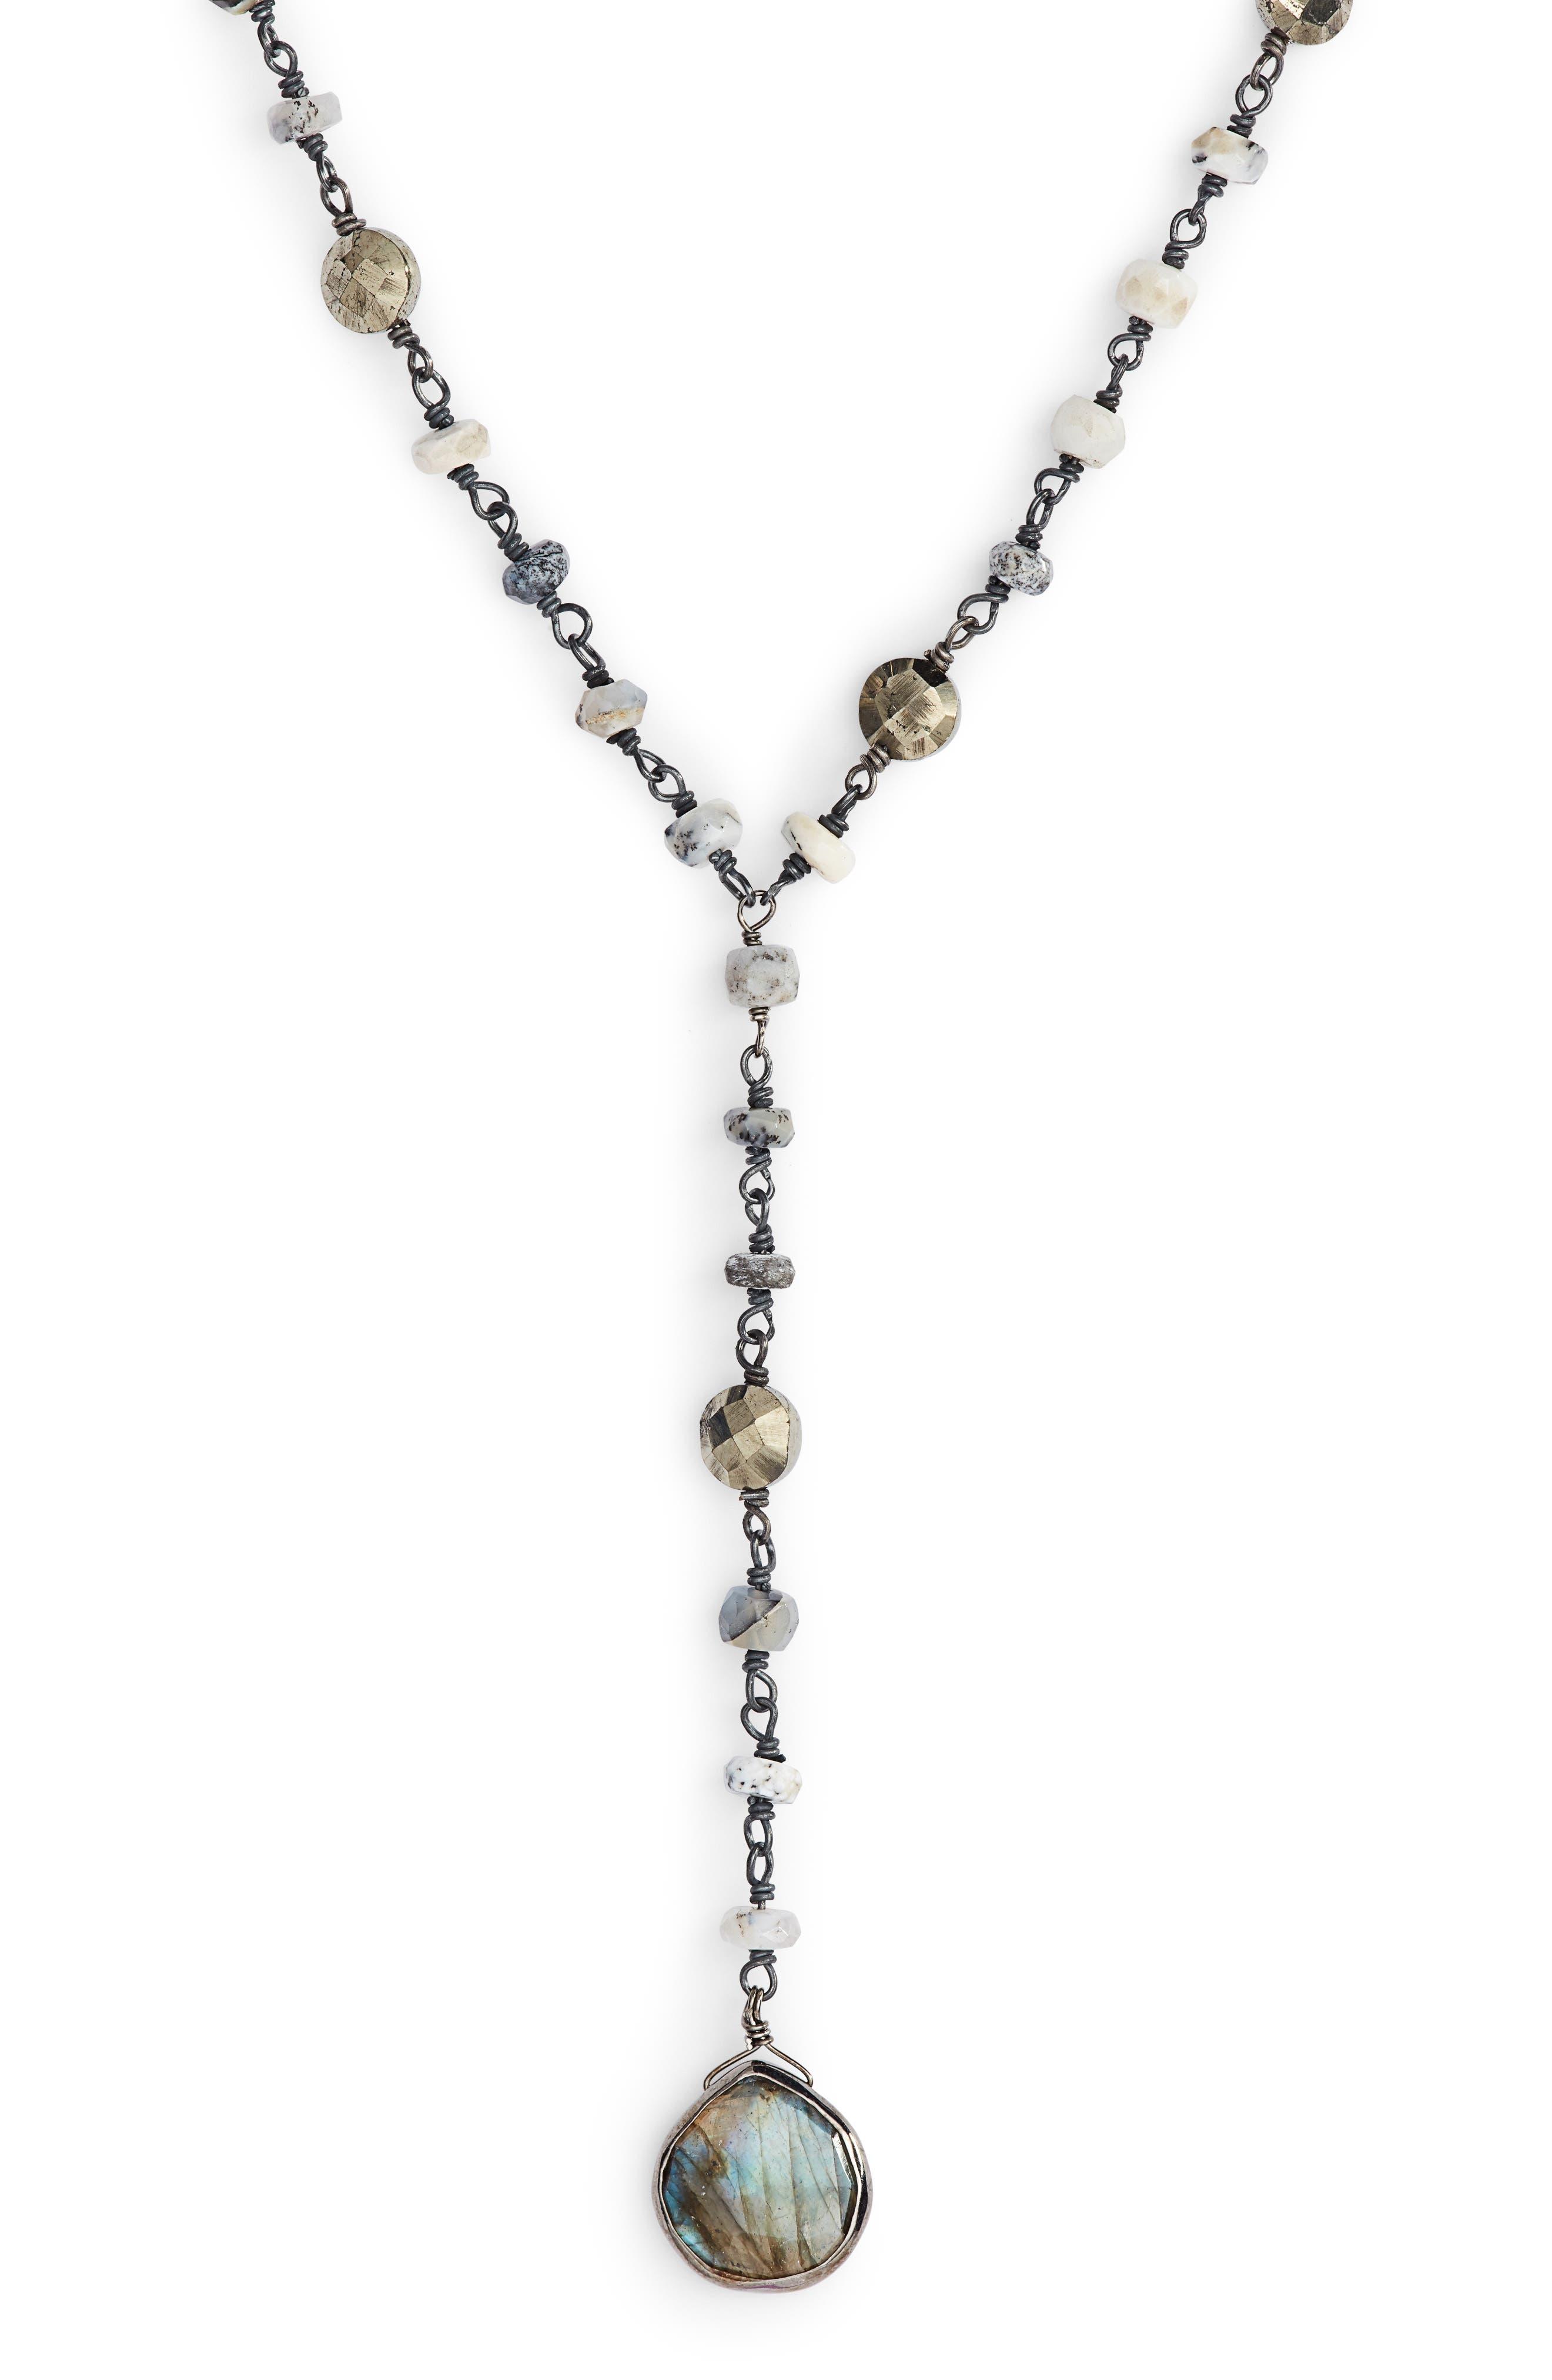 Yaeli Semiprecious Y-Necklace,                             Main thumbnail 1, color,                             DENDRITE OPAL/ LABRADORITE